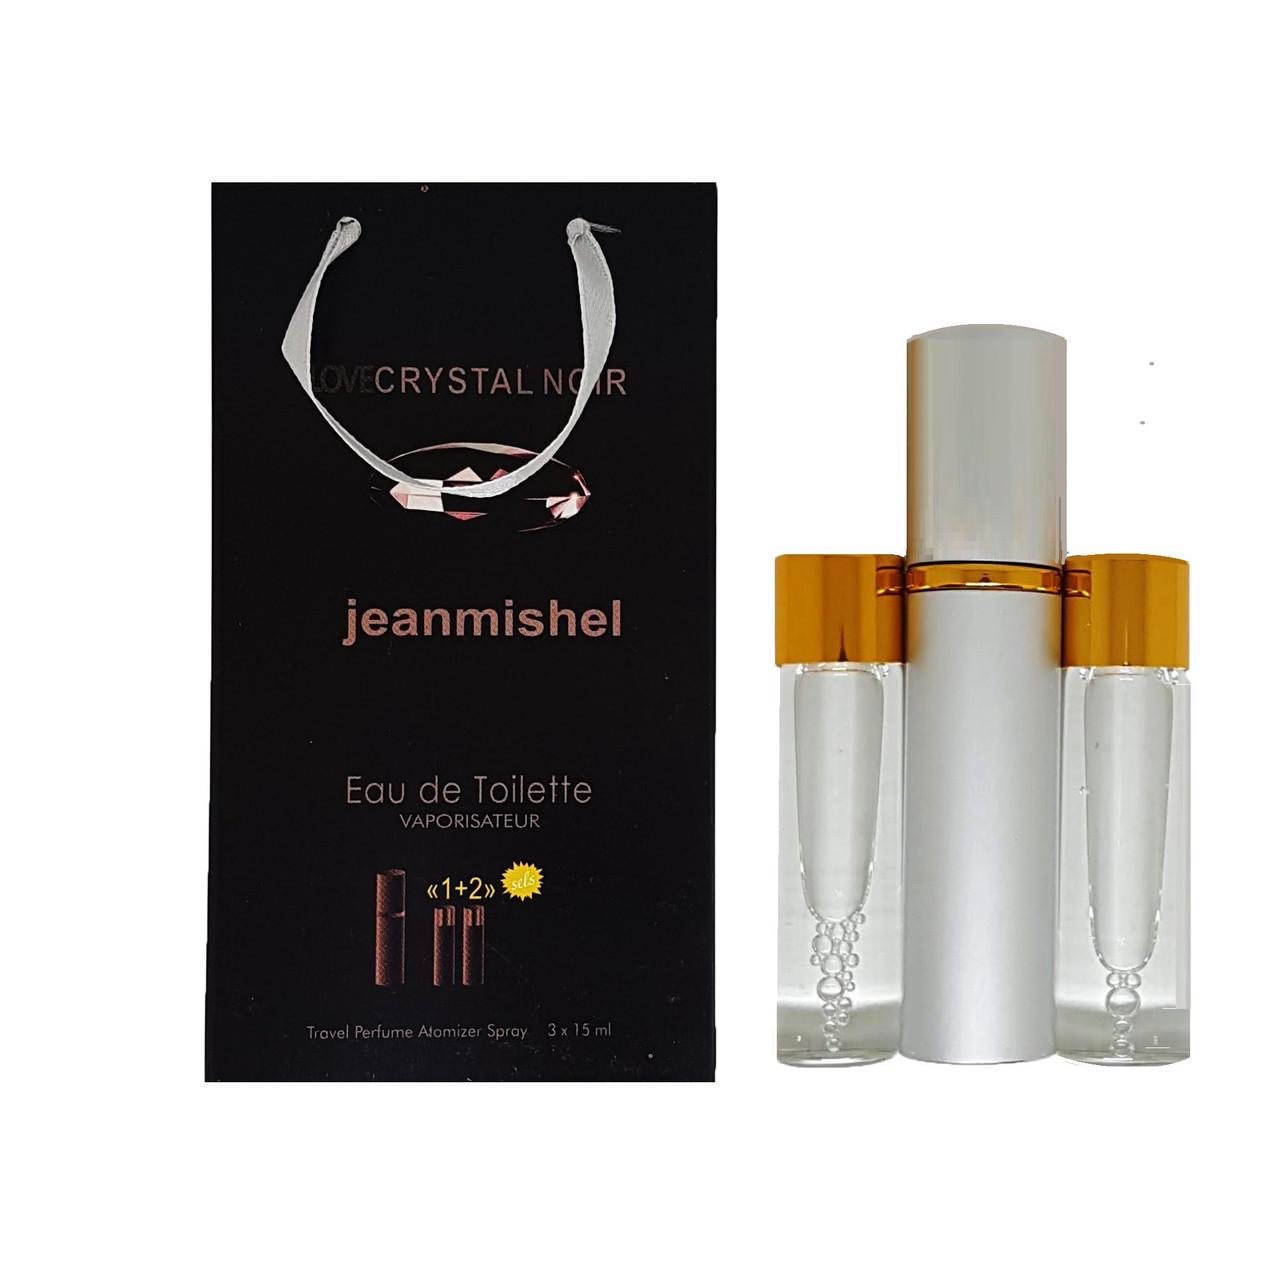 Jeanmishel Love Crystal Noir (72) 3 x 15 ml